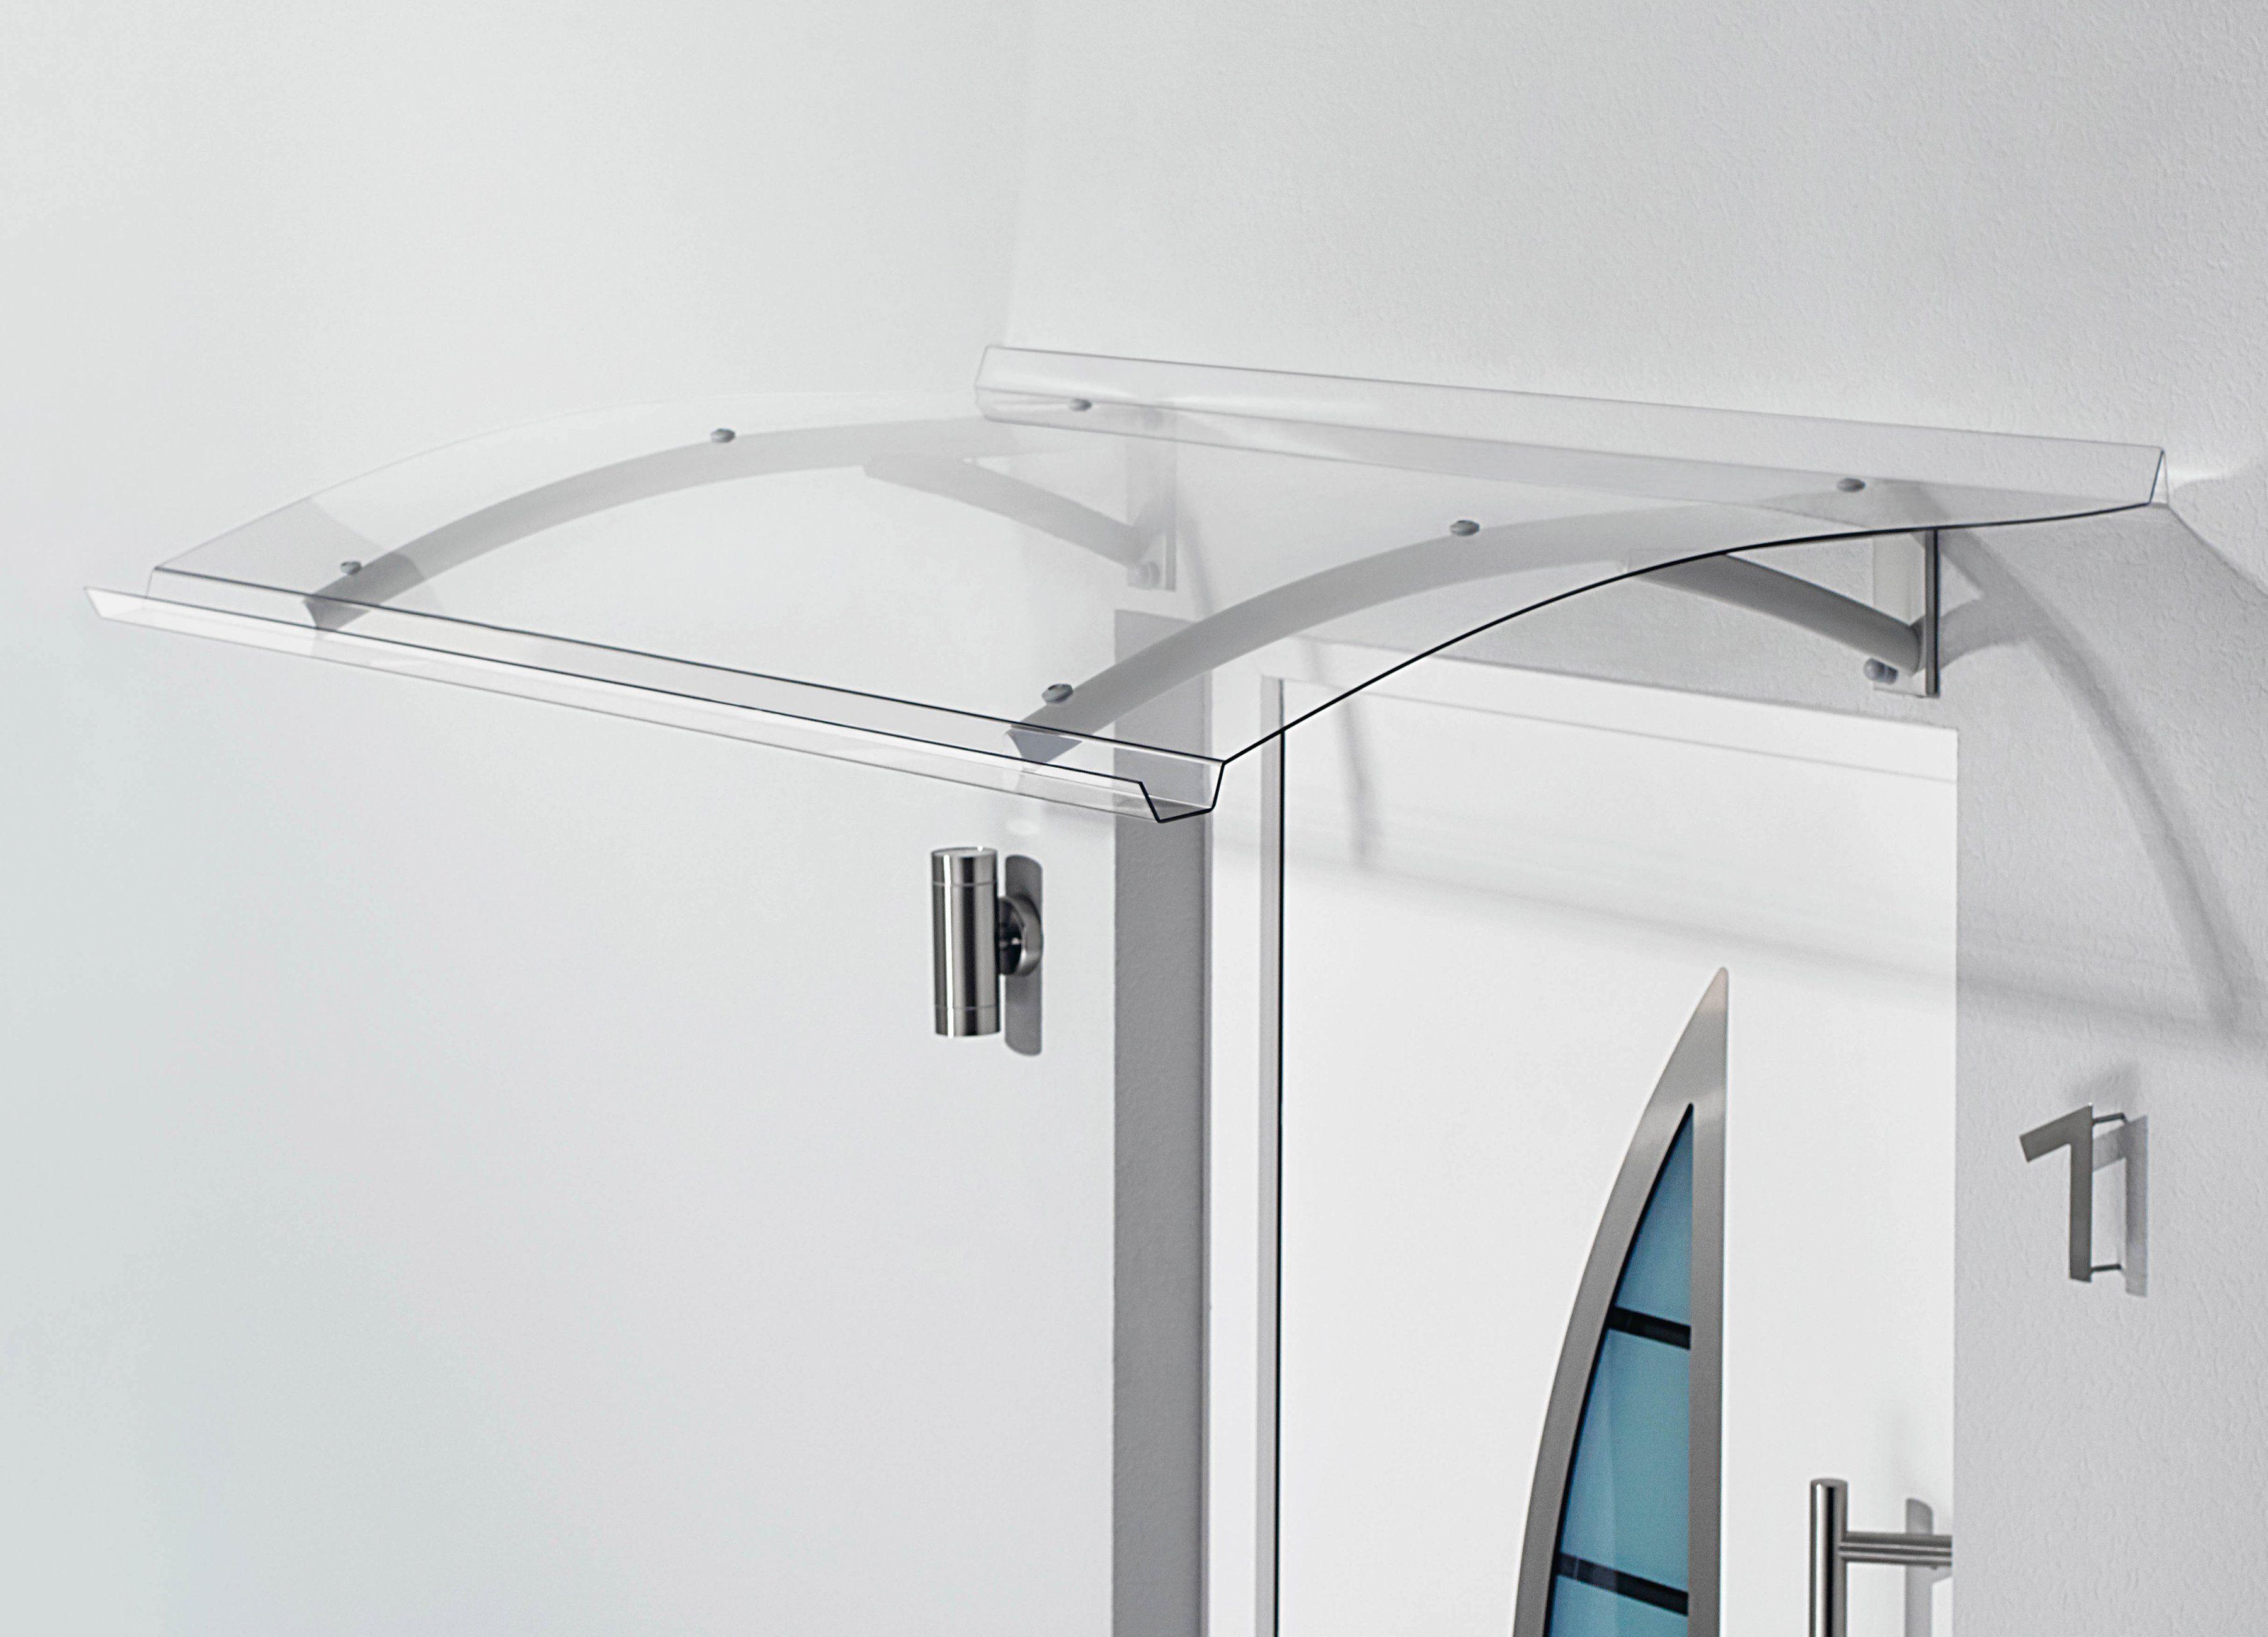 Pultvordach »TYP PT SECCO«, 150x90x22 cm, silberfarben-transparent